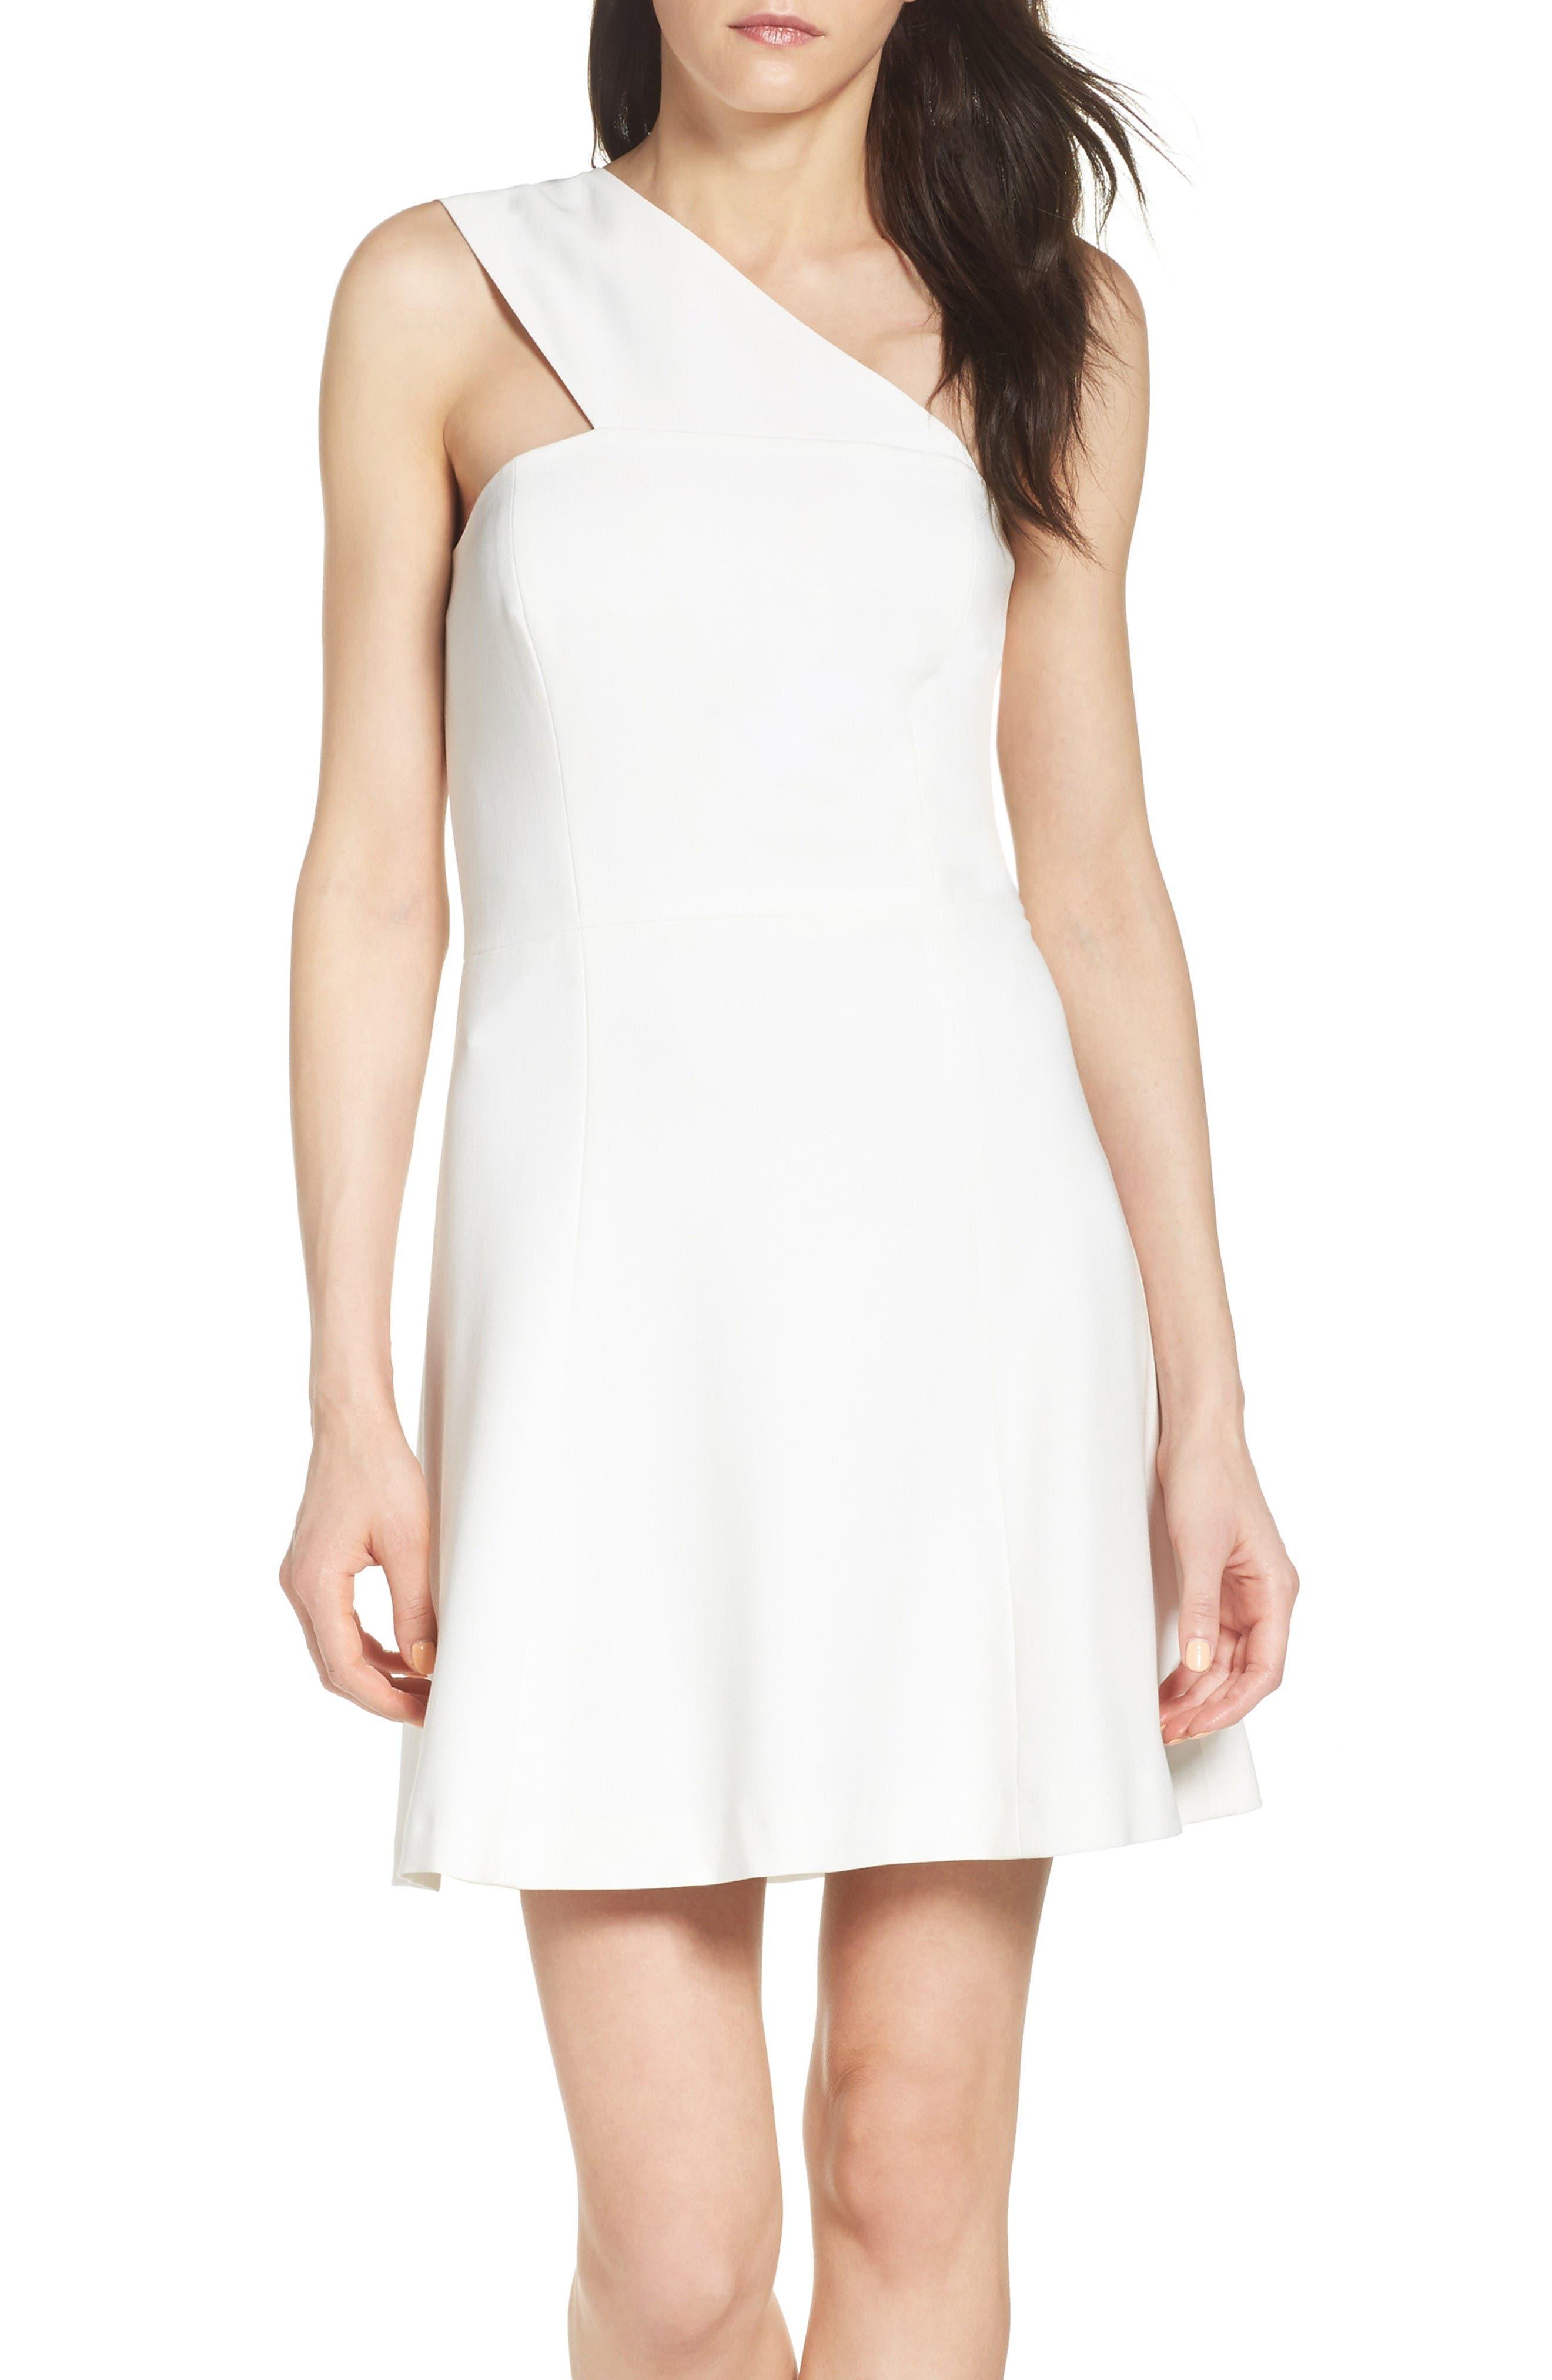 Alternate Image 1 Selected - French Connection Whisper Light Dress